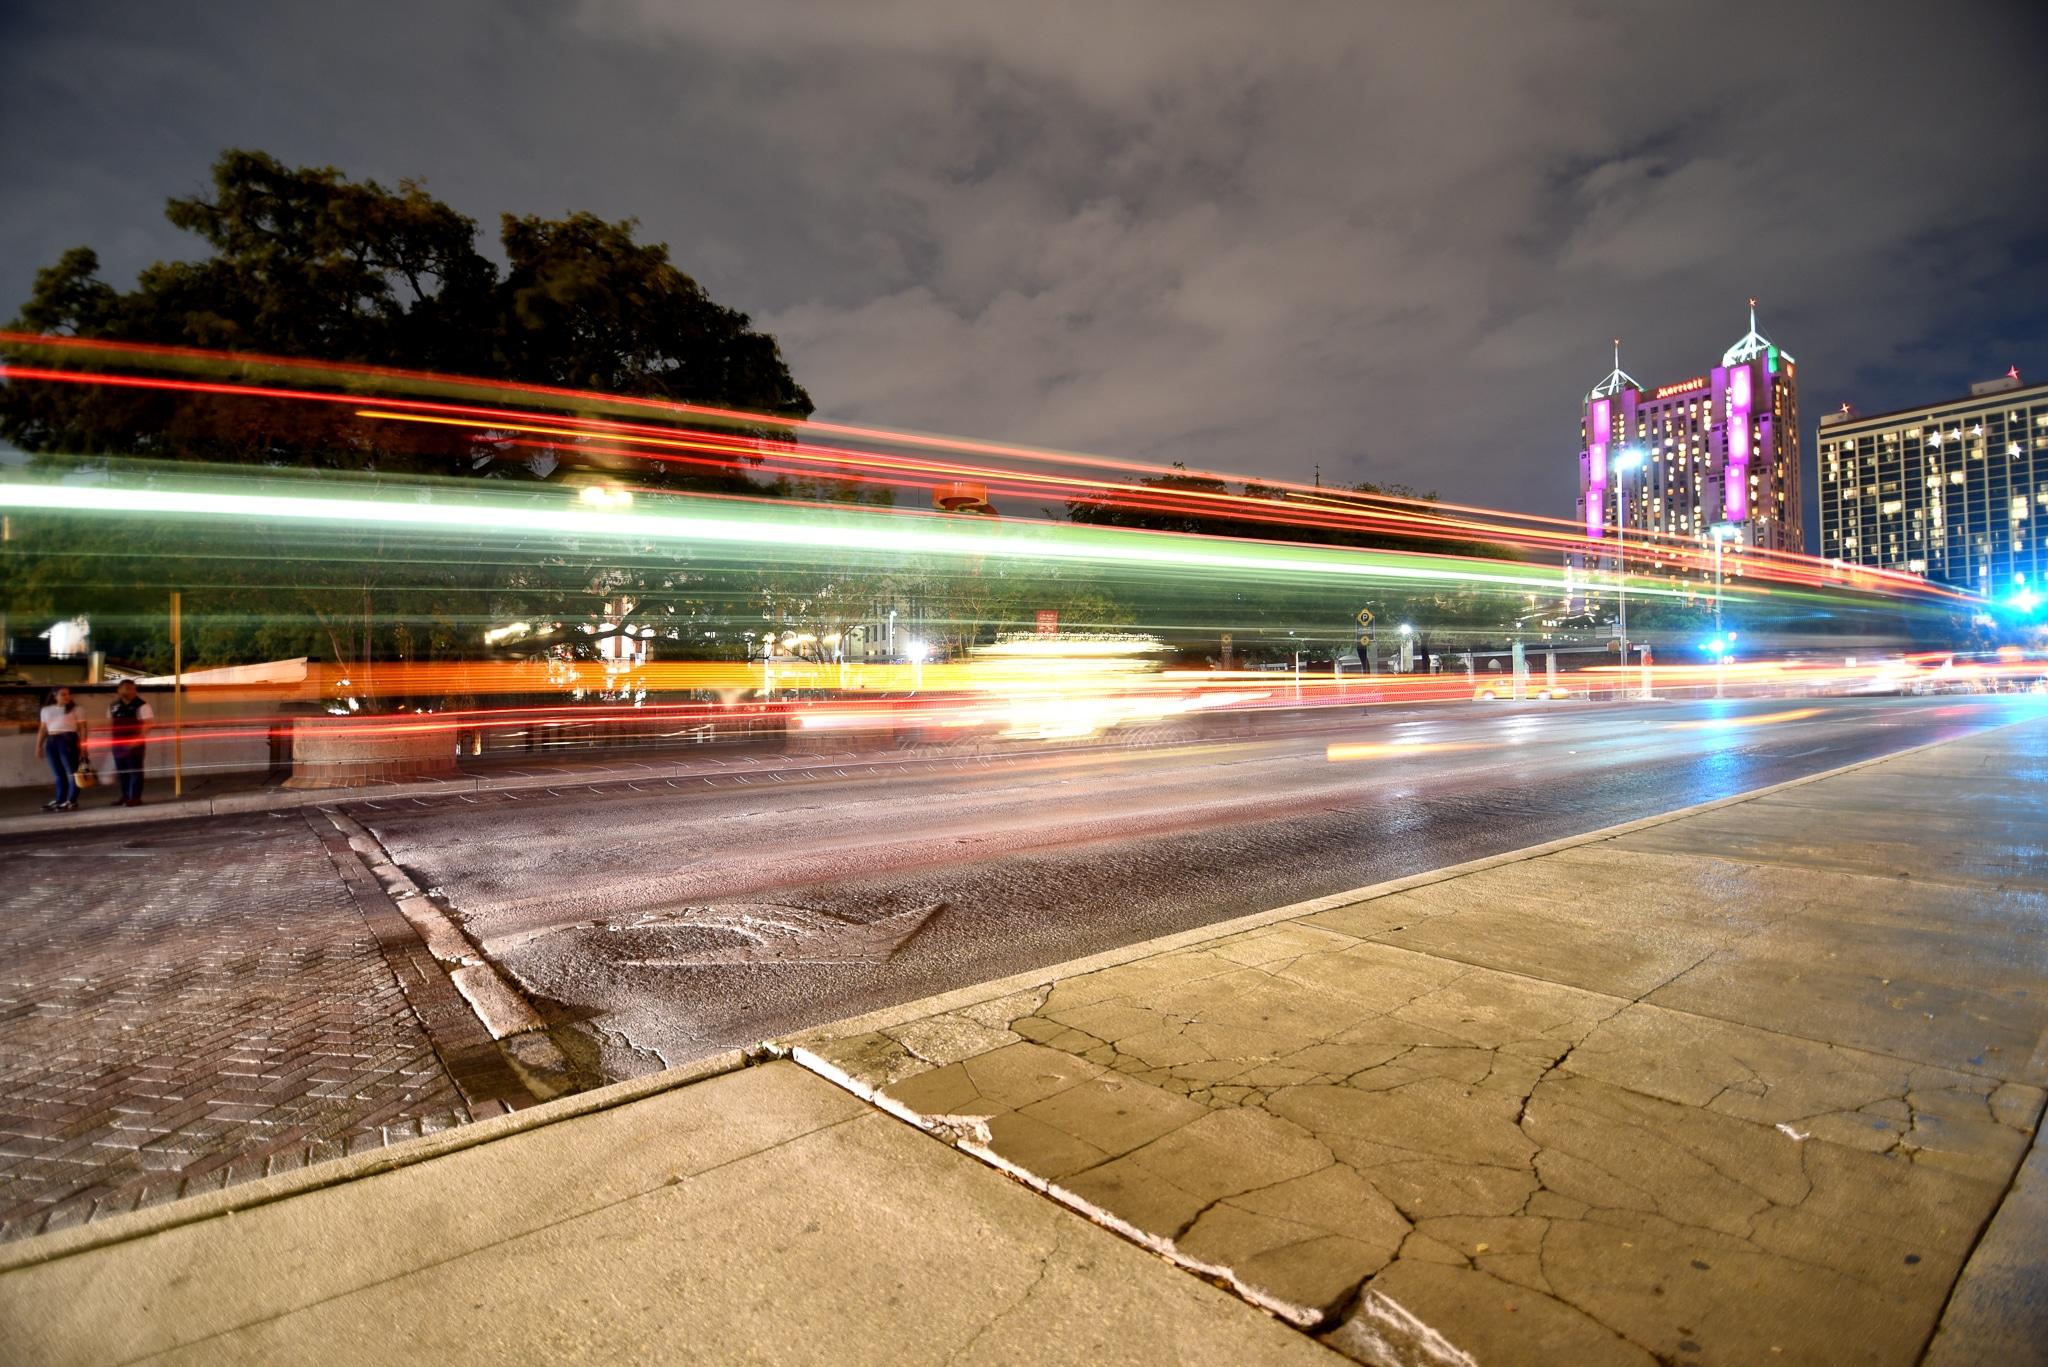 slow shutter speed for car lights trails